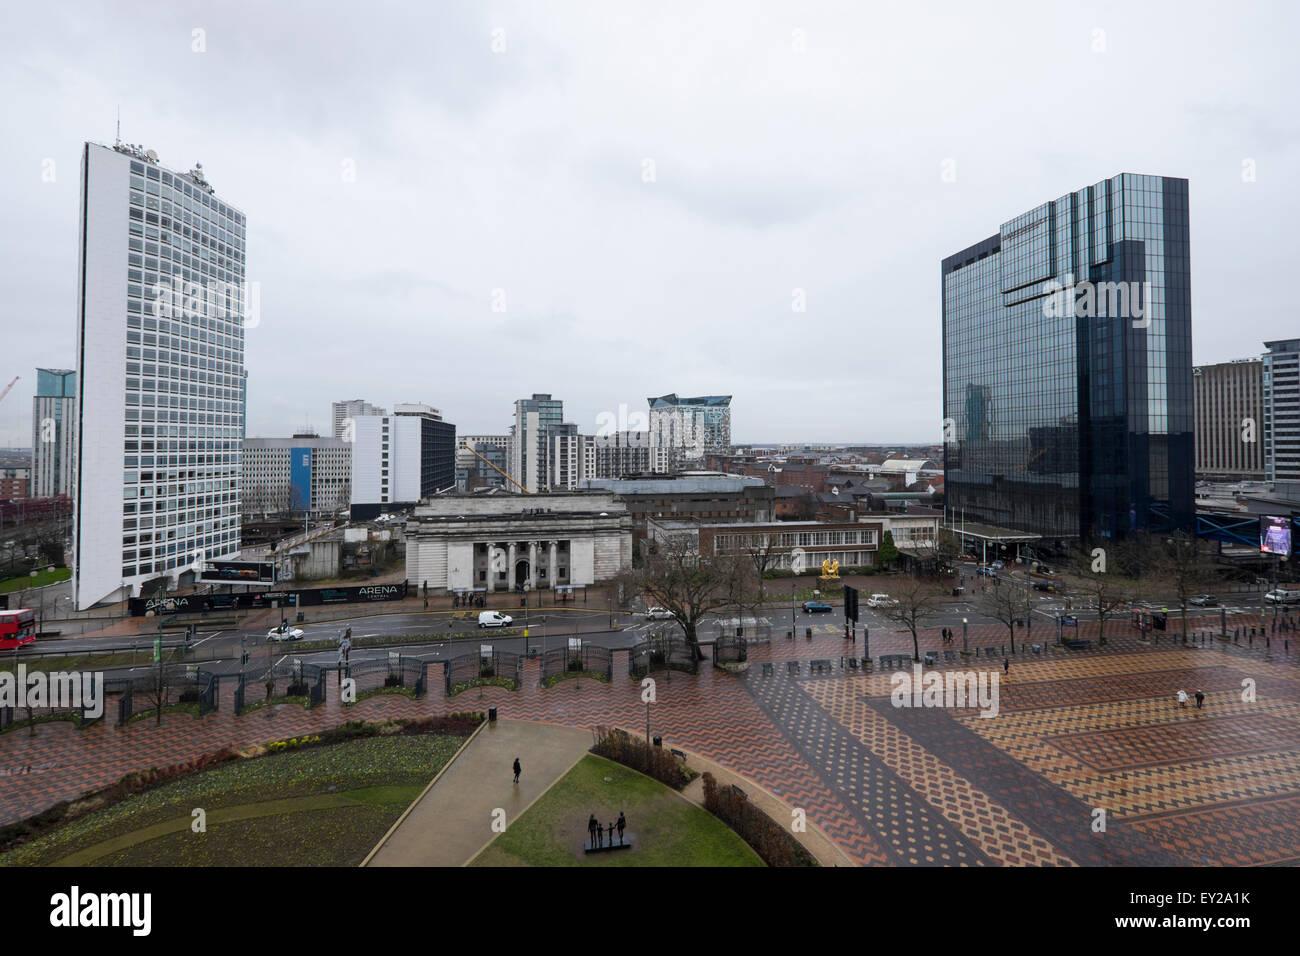 Panoramic view of Birmingham city centre - Stock Image